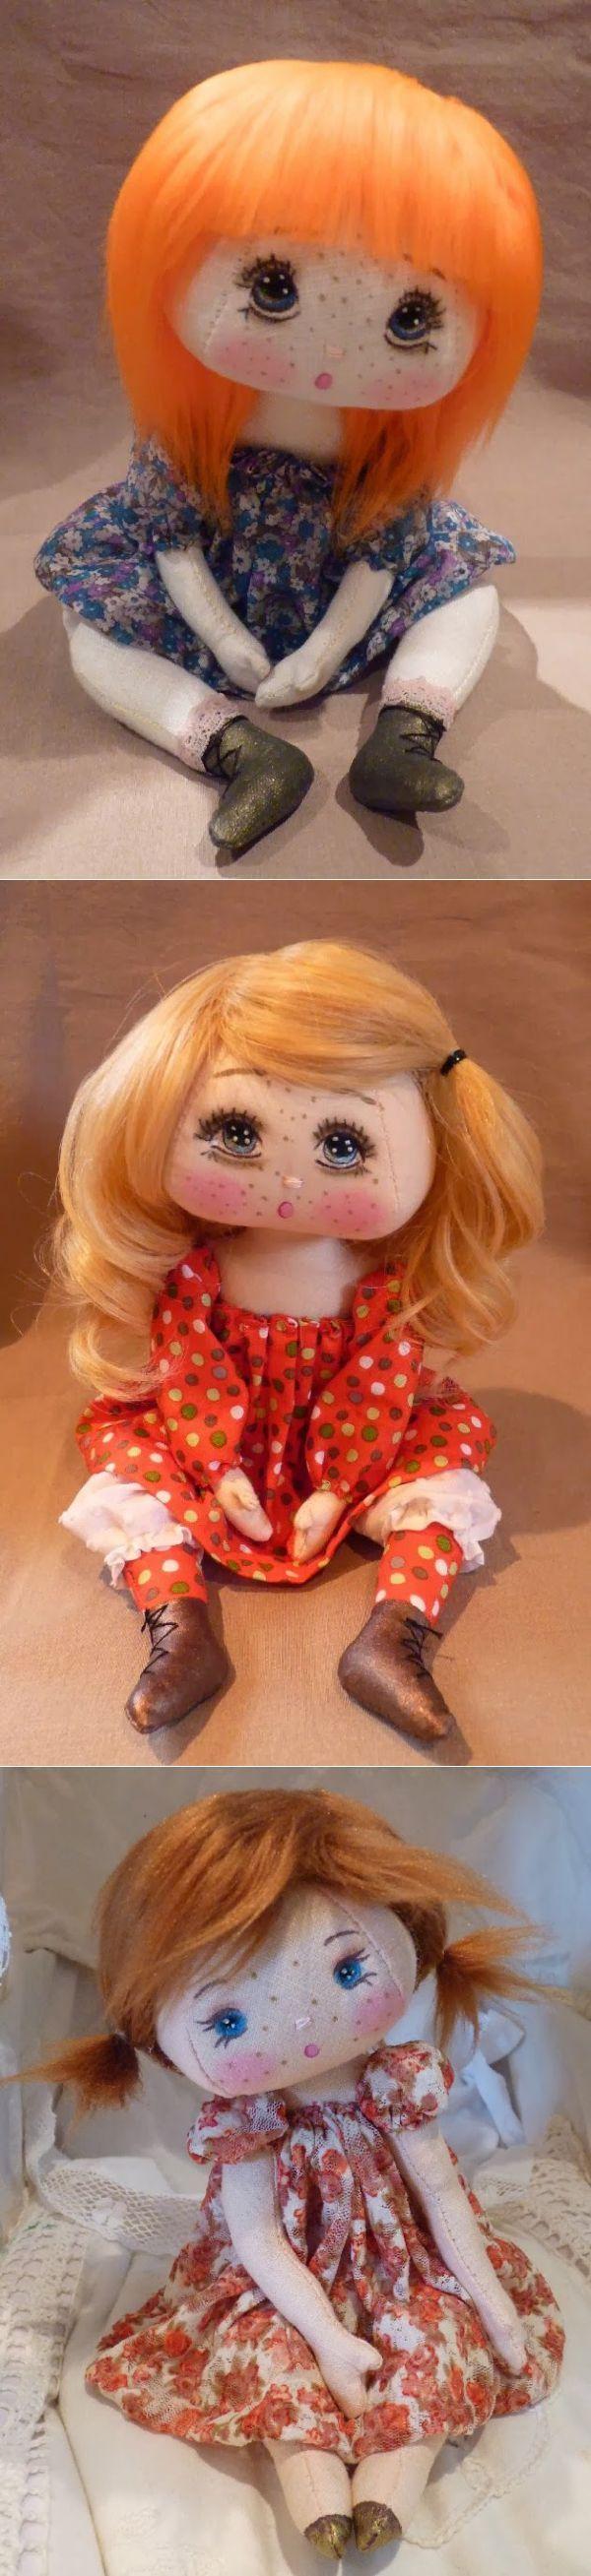 Luciérnagas muñeca divertidos de La Ronde AUX Lucioles.